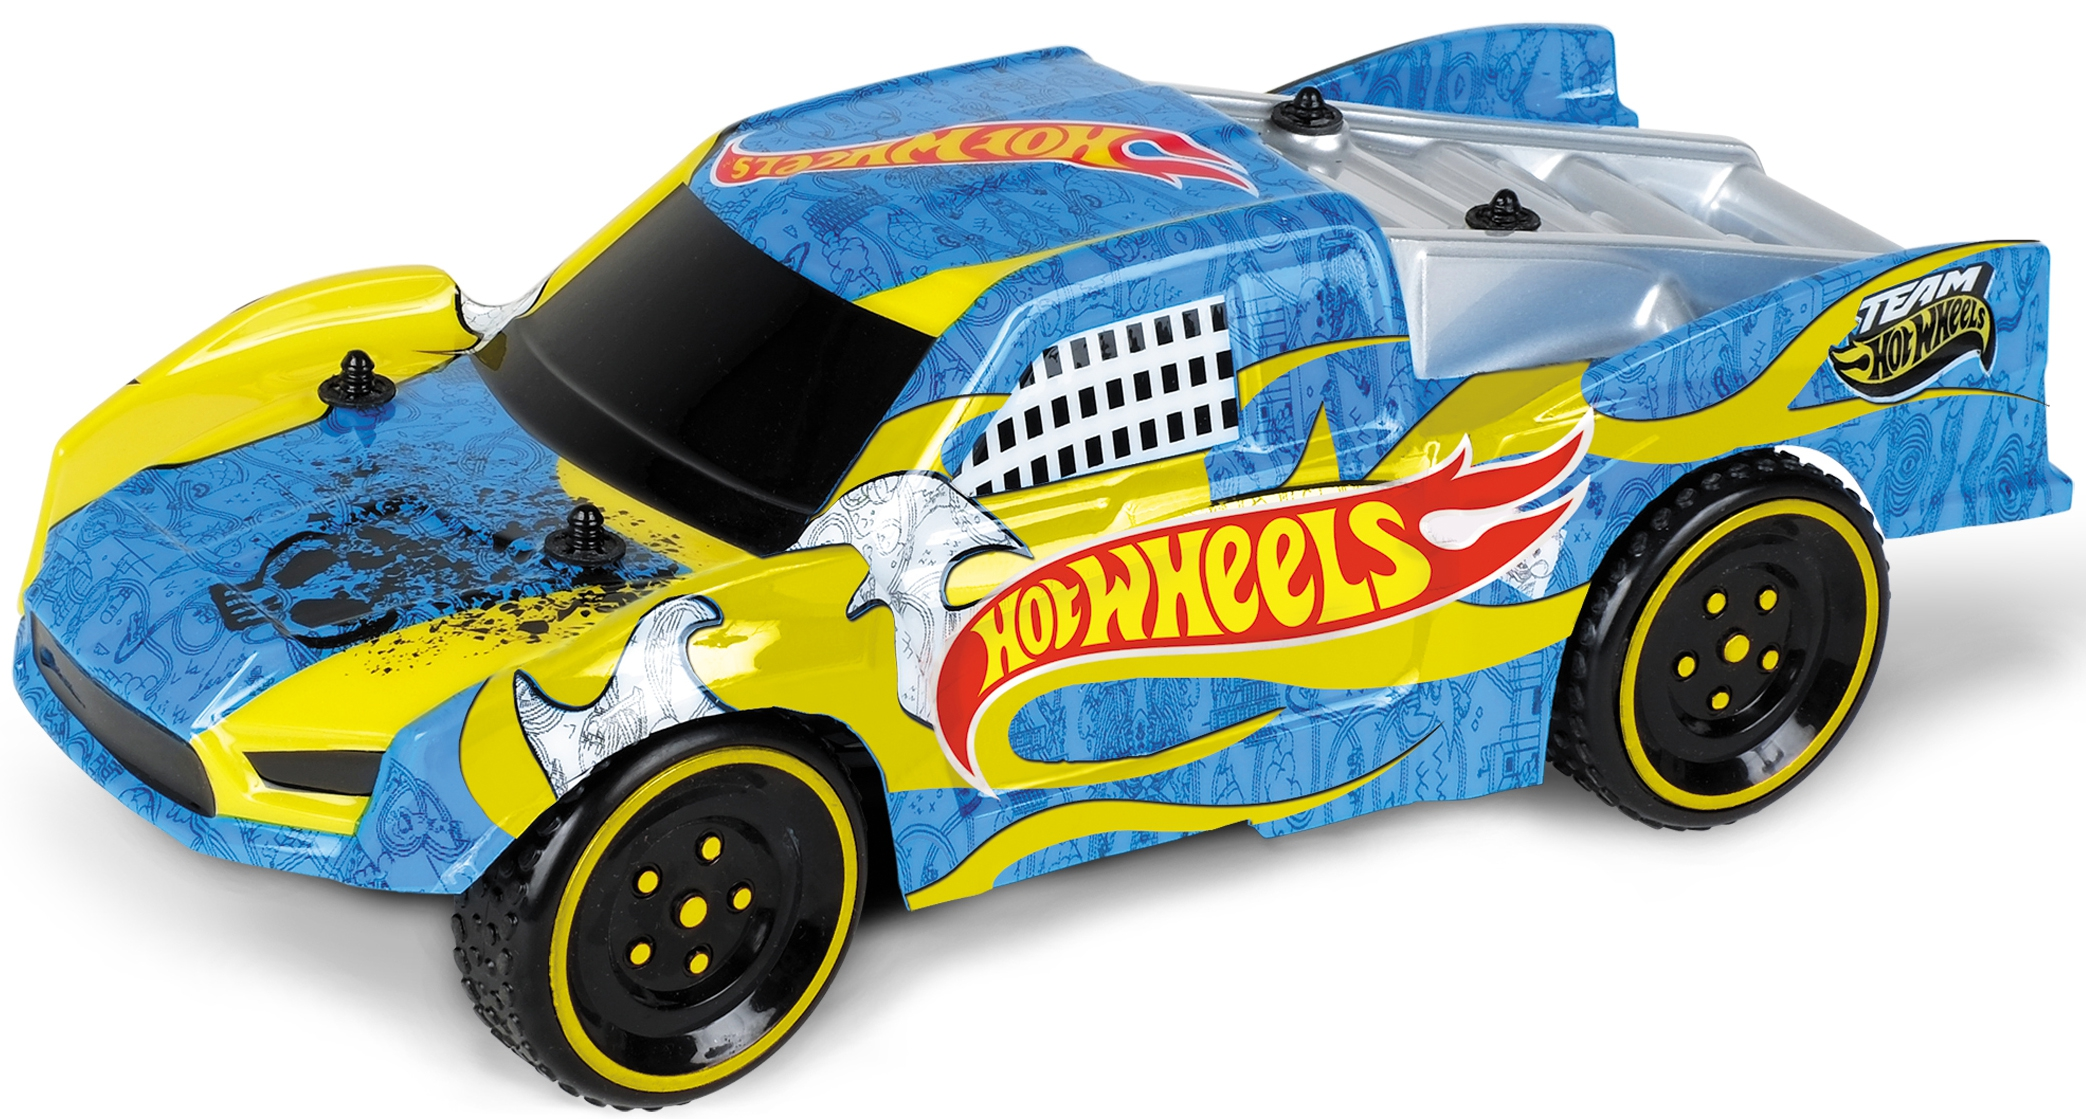 Hot Wheels Hot Wheels на радиоуправлении Hot Wheels 2 в 1 со сменным корпусом машина р у mondo hot wheels 1 16